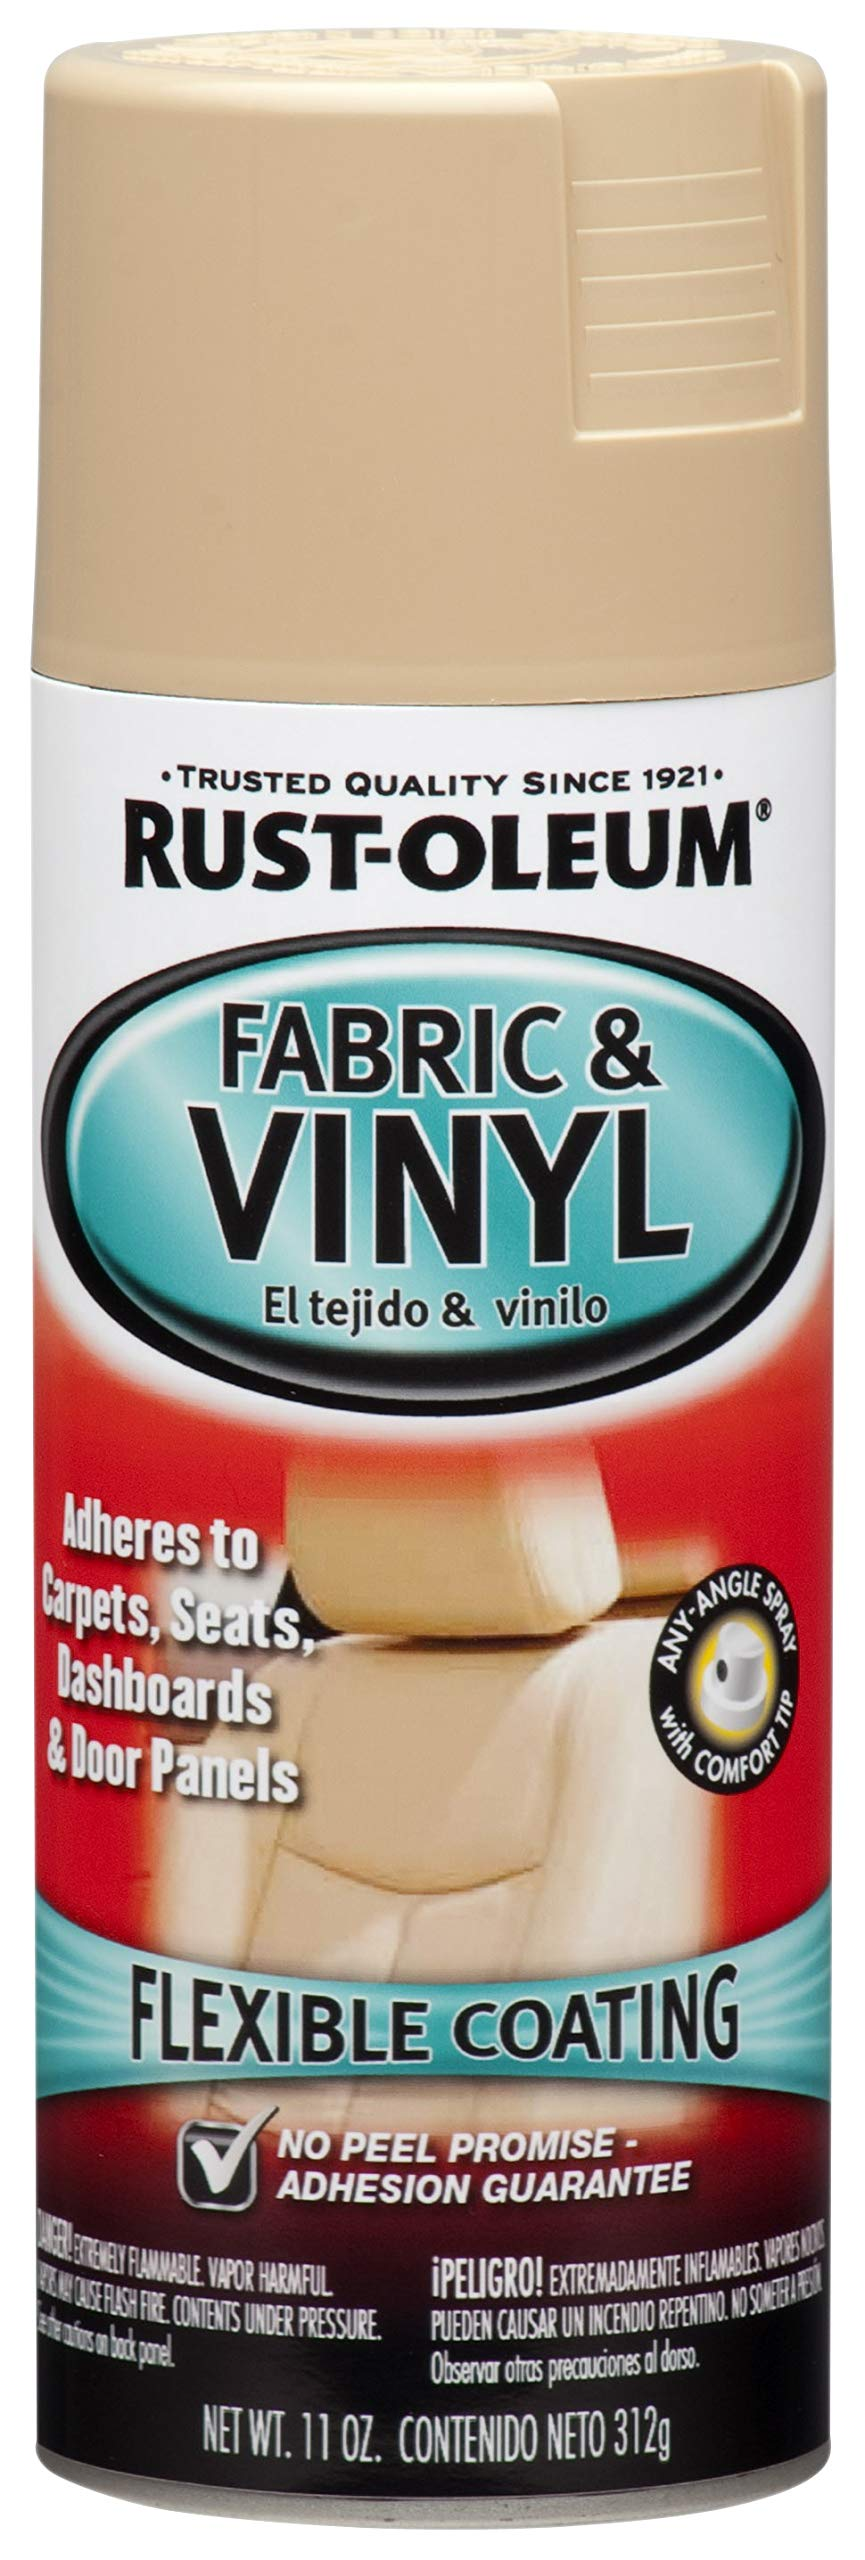 Rust-Oleum 248921 Automotive Enamel Fabric & Vinyl Spray Paint, 11 Oz, Beige